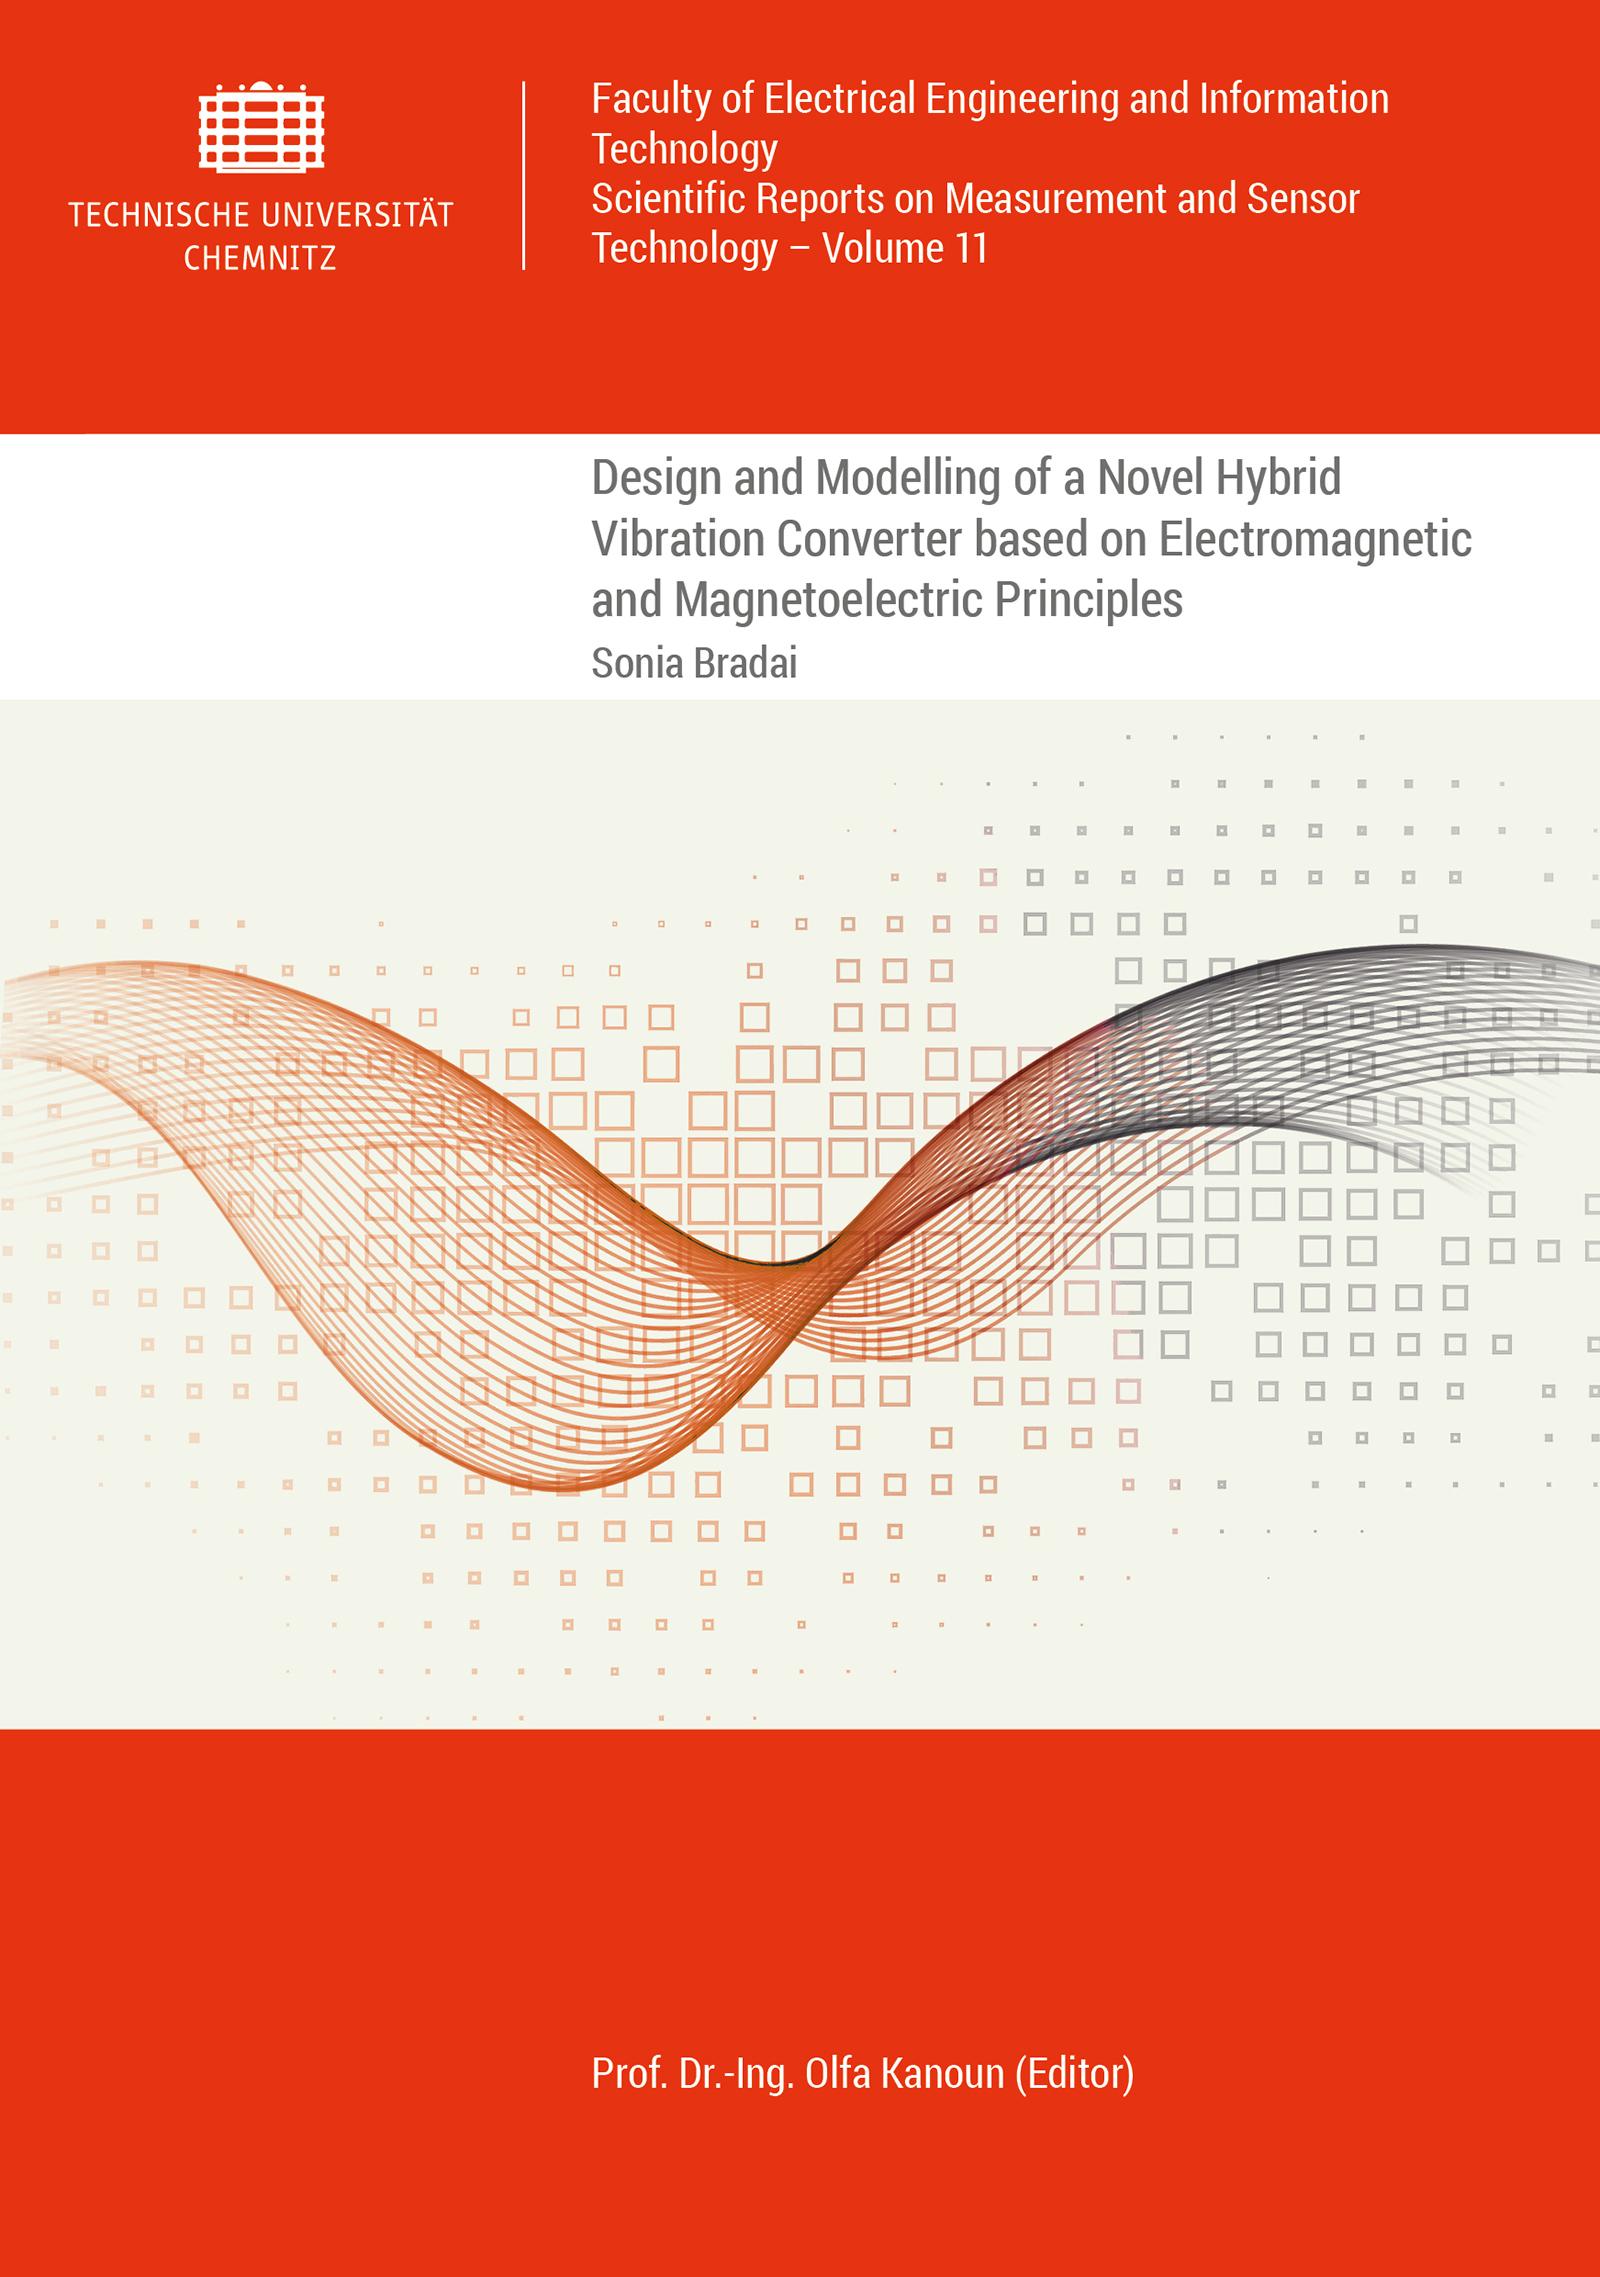 Cover: Design and Modelling of Novel Hybrid Vibration Converter based on Electromagnetic and Magnetoelectric Principles